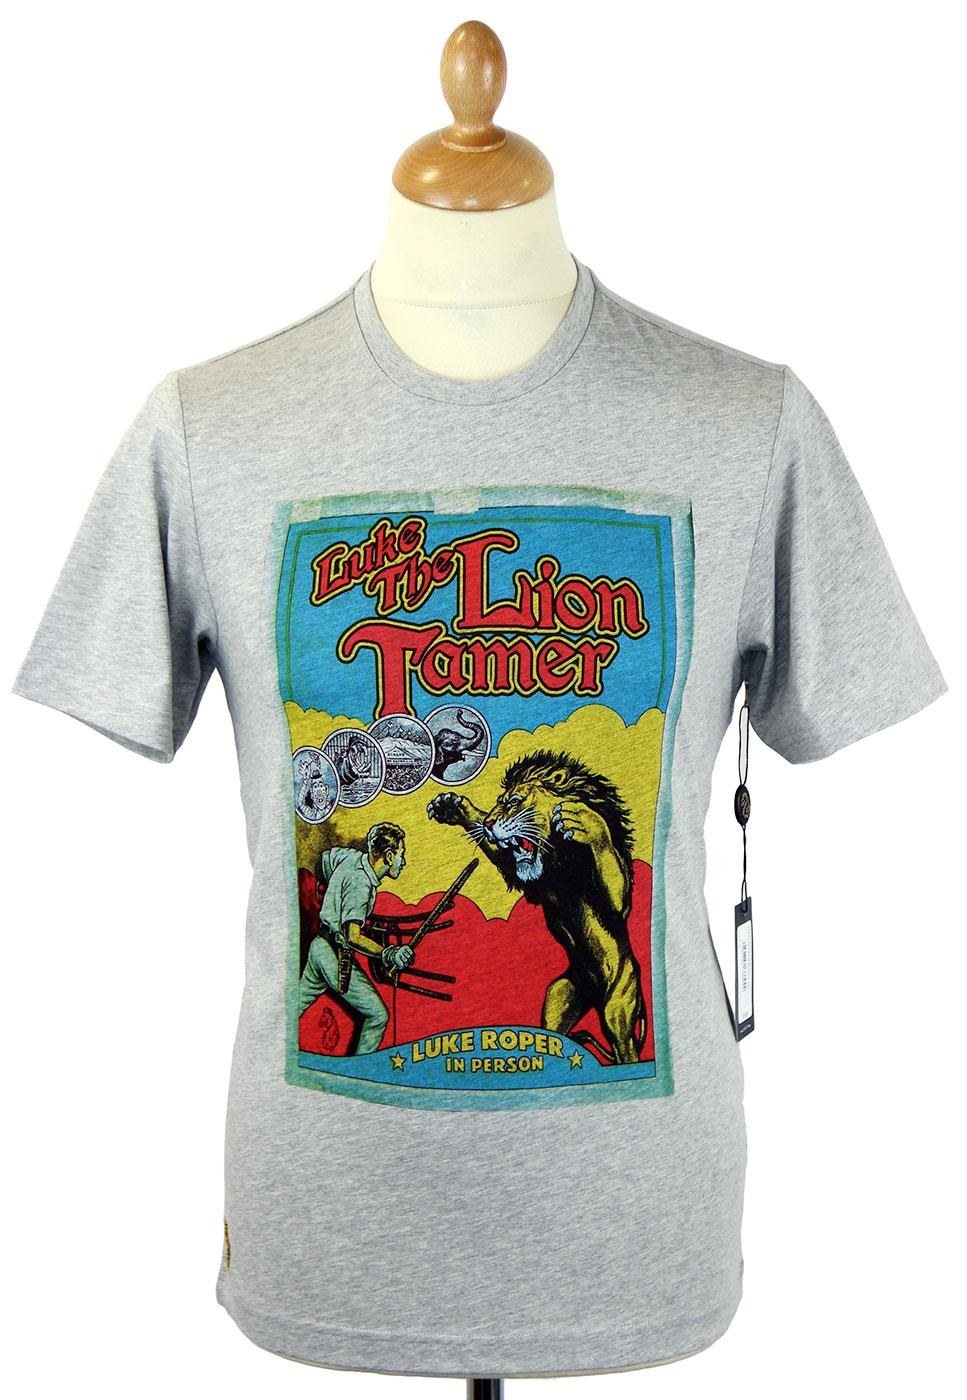 Lion Tamer 1 LUKE 1977 Vintage Poster T-Shirt